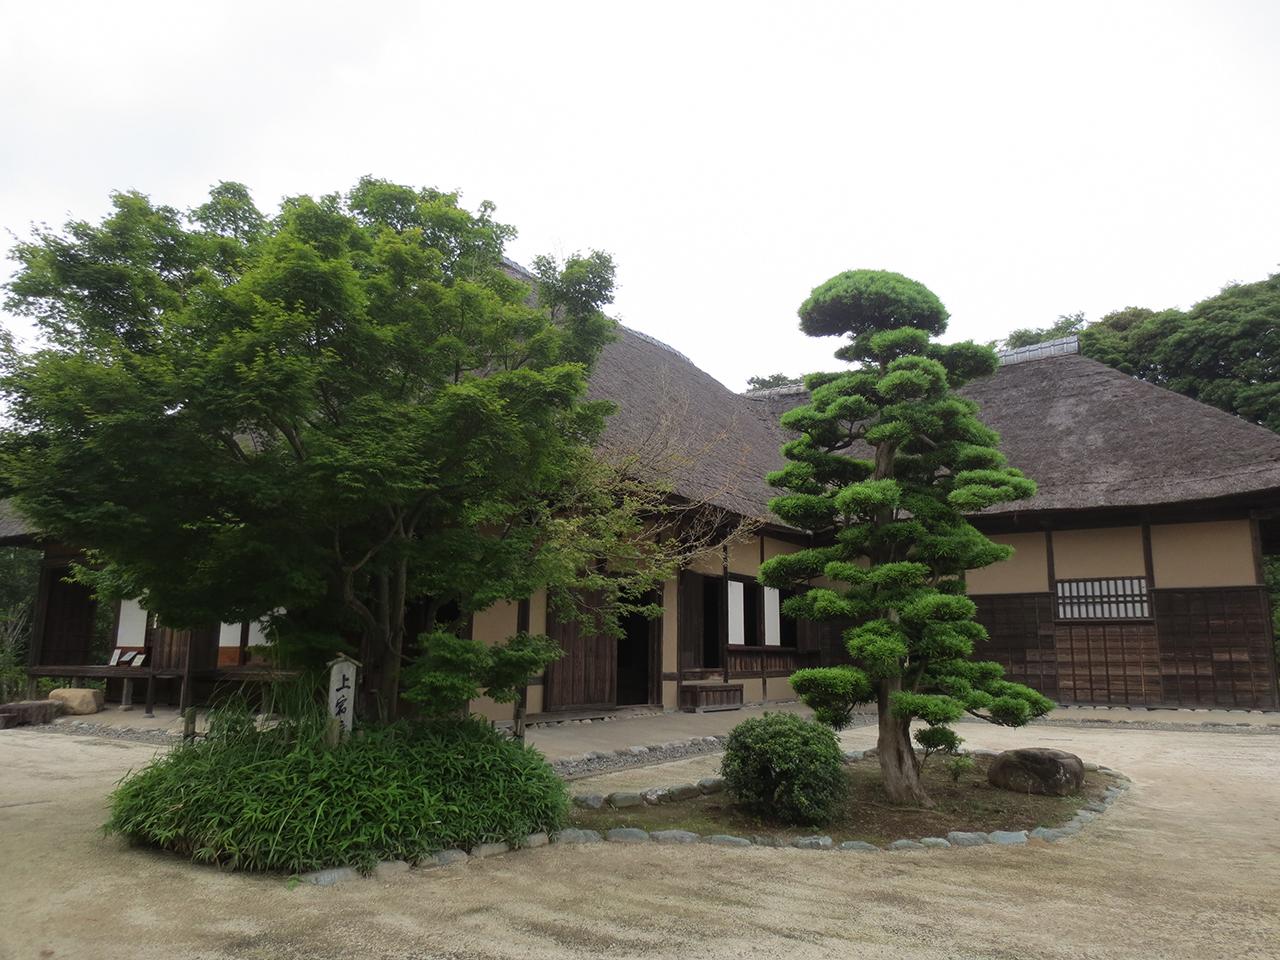 実籾本郷公園の投稿写真1